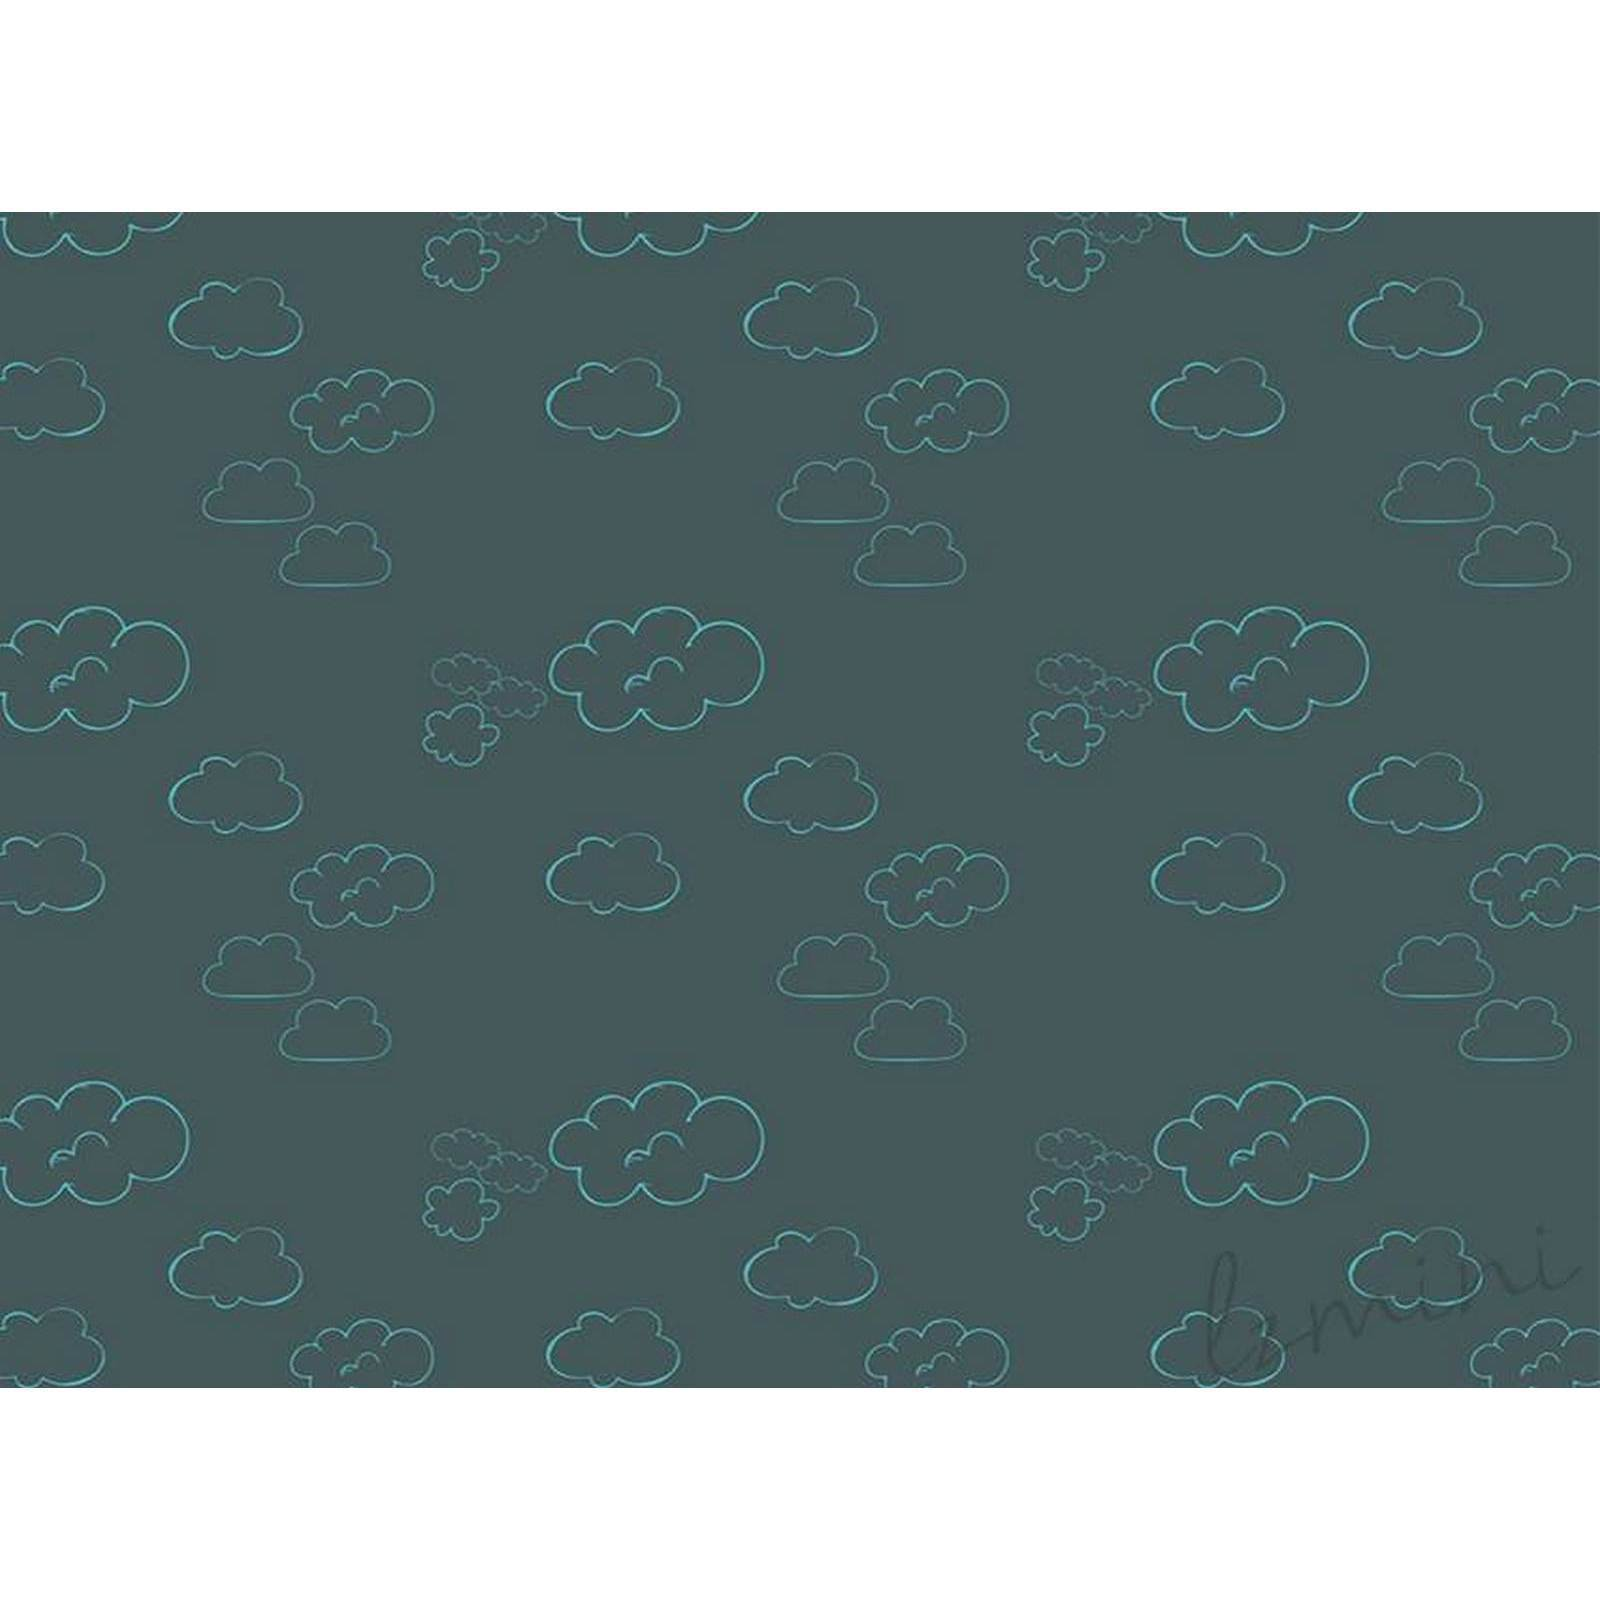 Papel de Parede Cloud H=2,50 CINZA ESCURO Papel de Parede